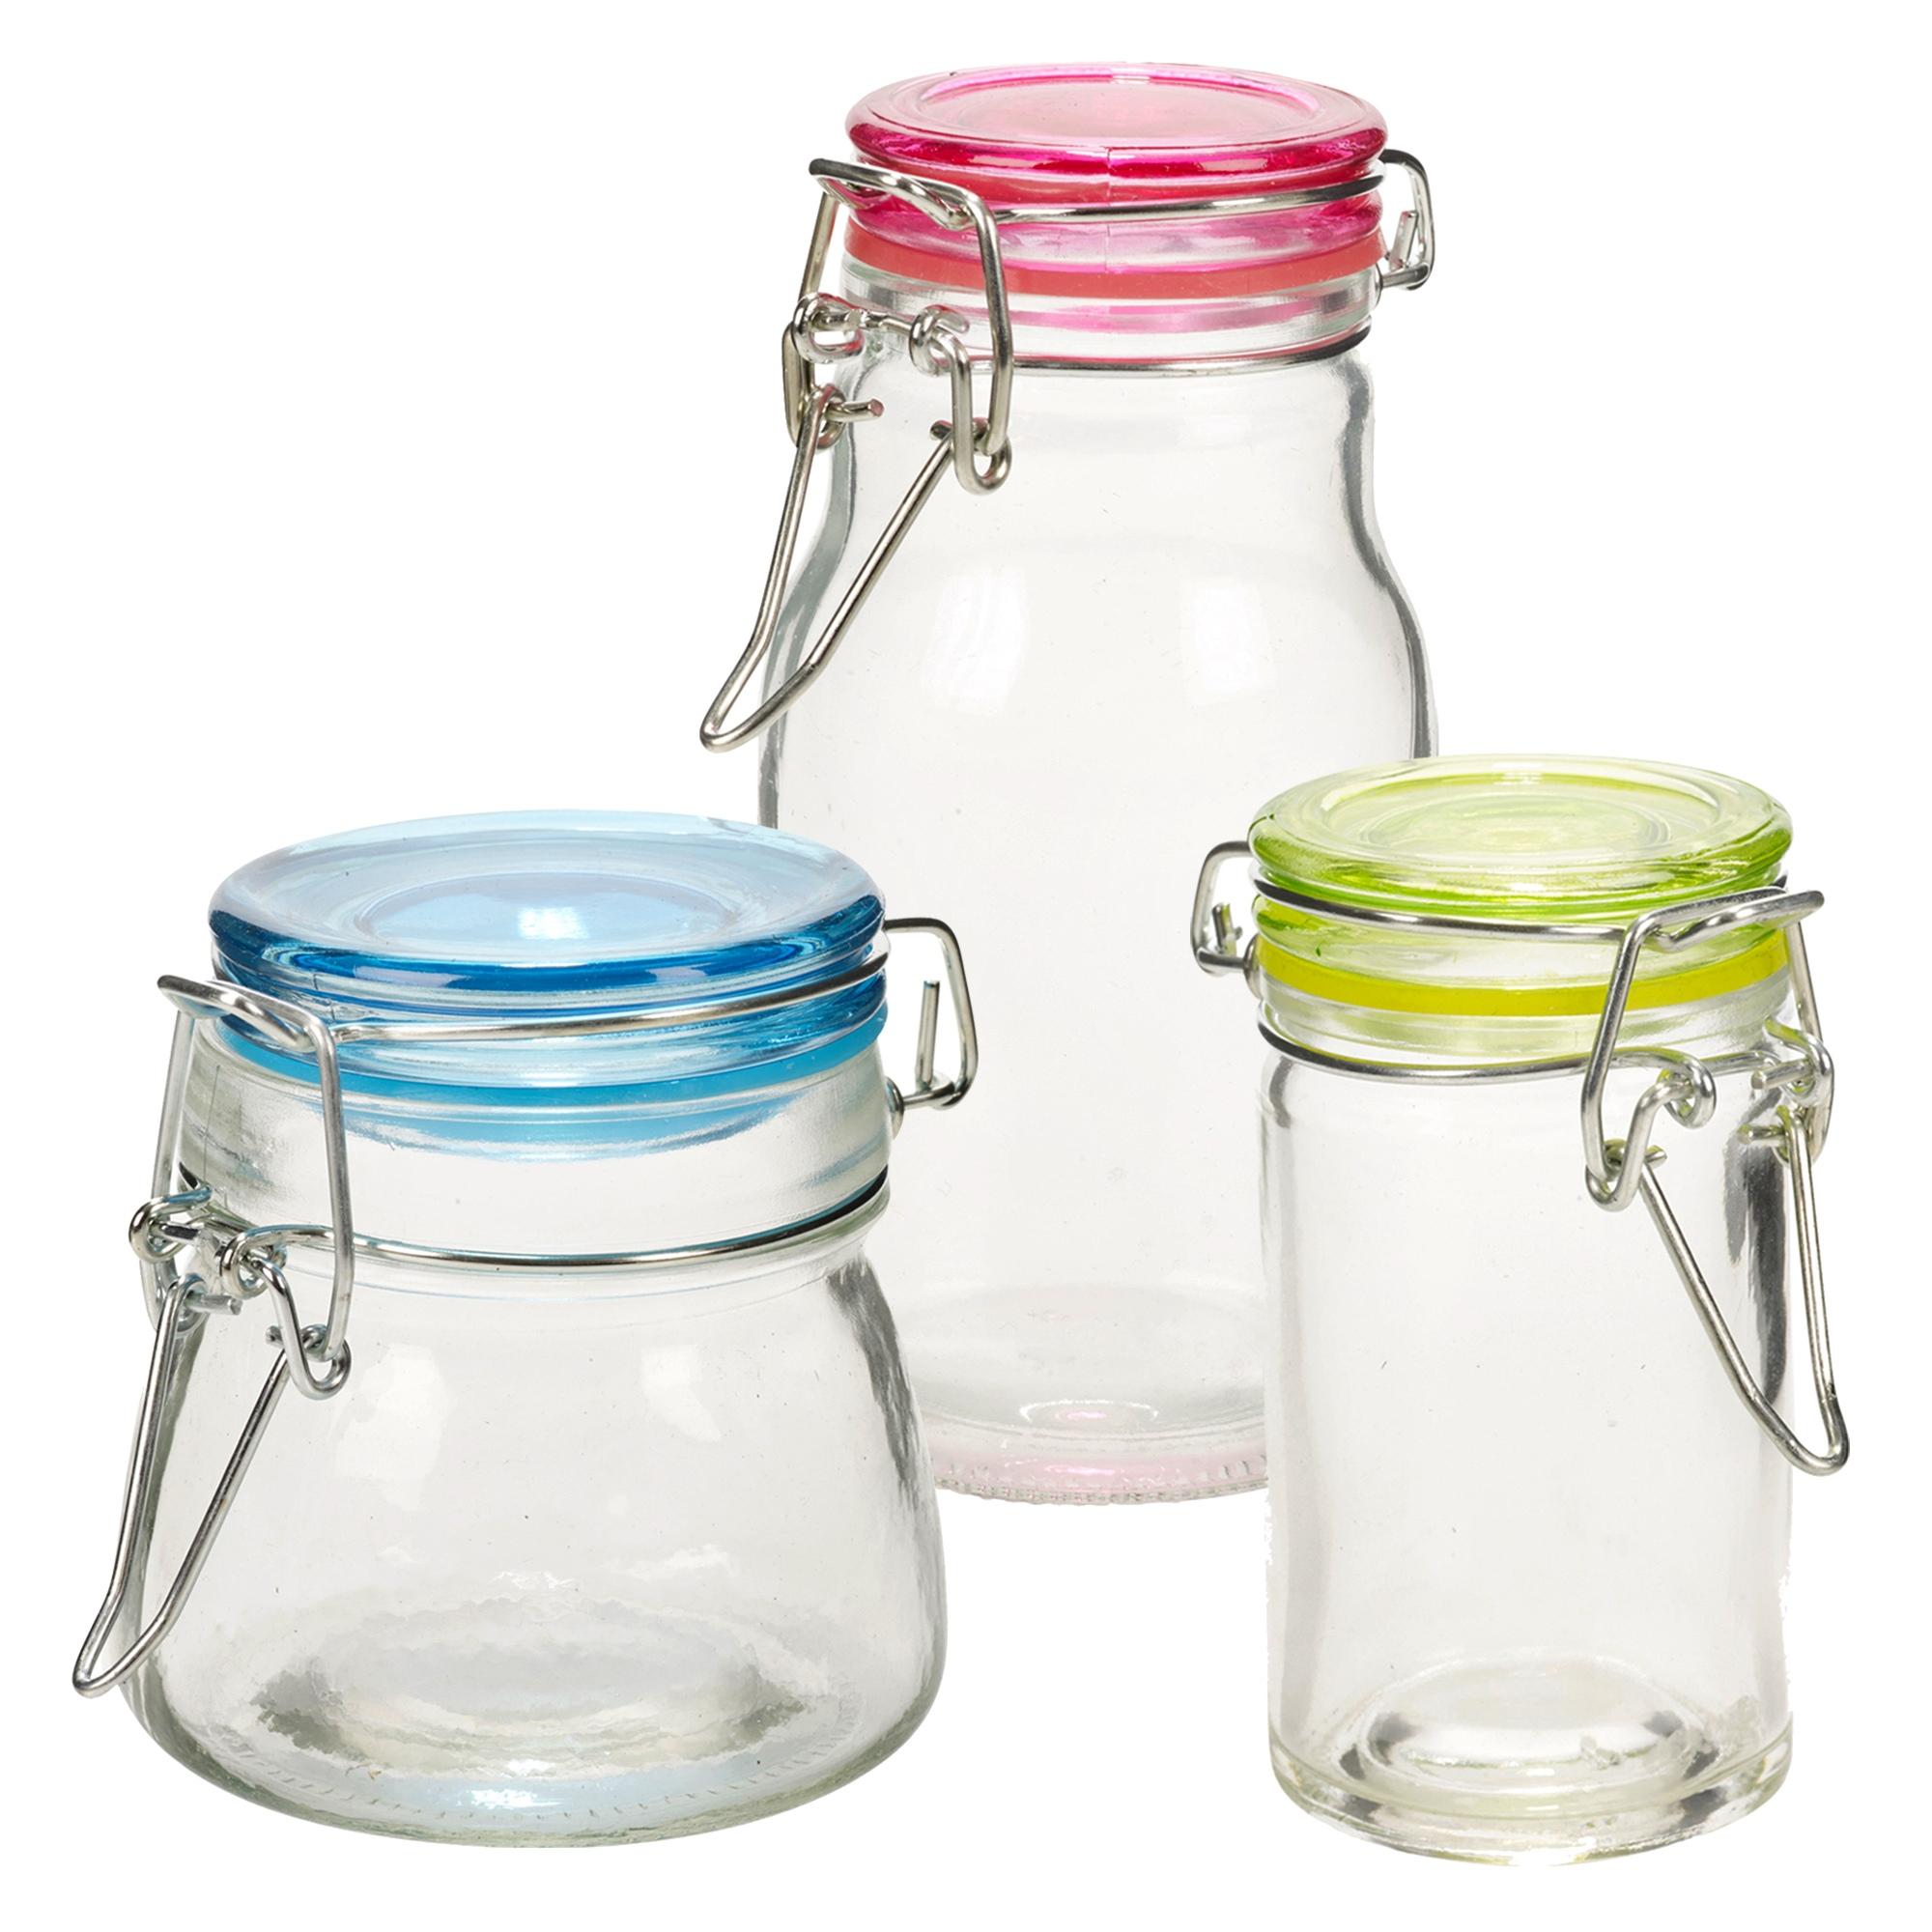 Set Of 3 Small Glass Storage Jar Metal Clamp Lid Air Tight